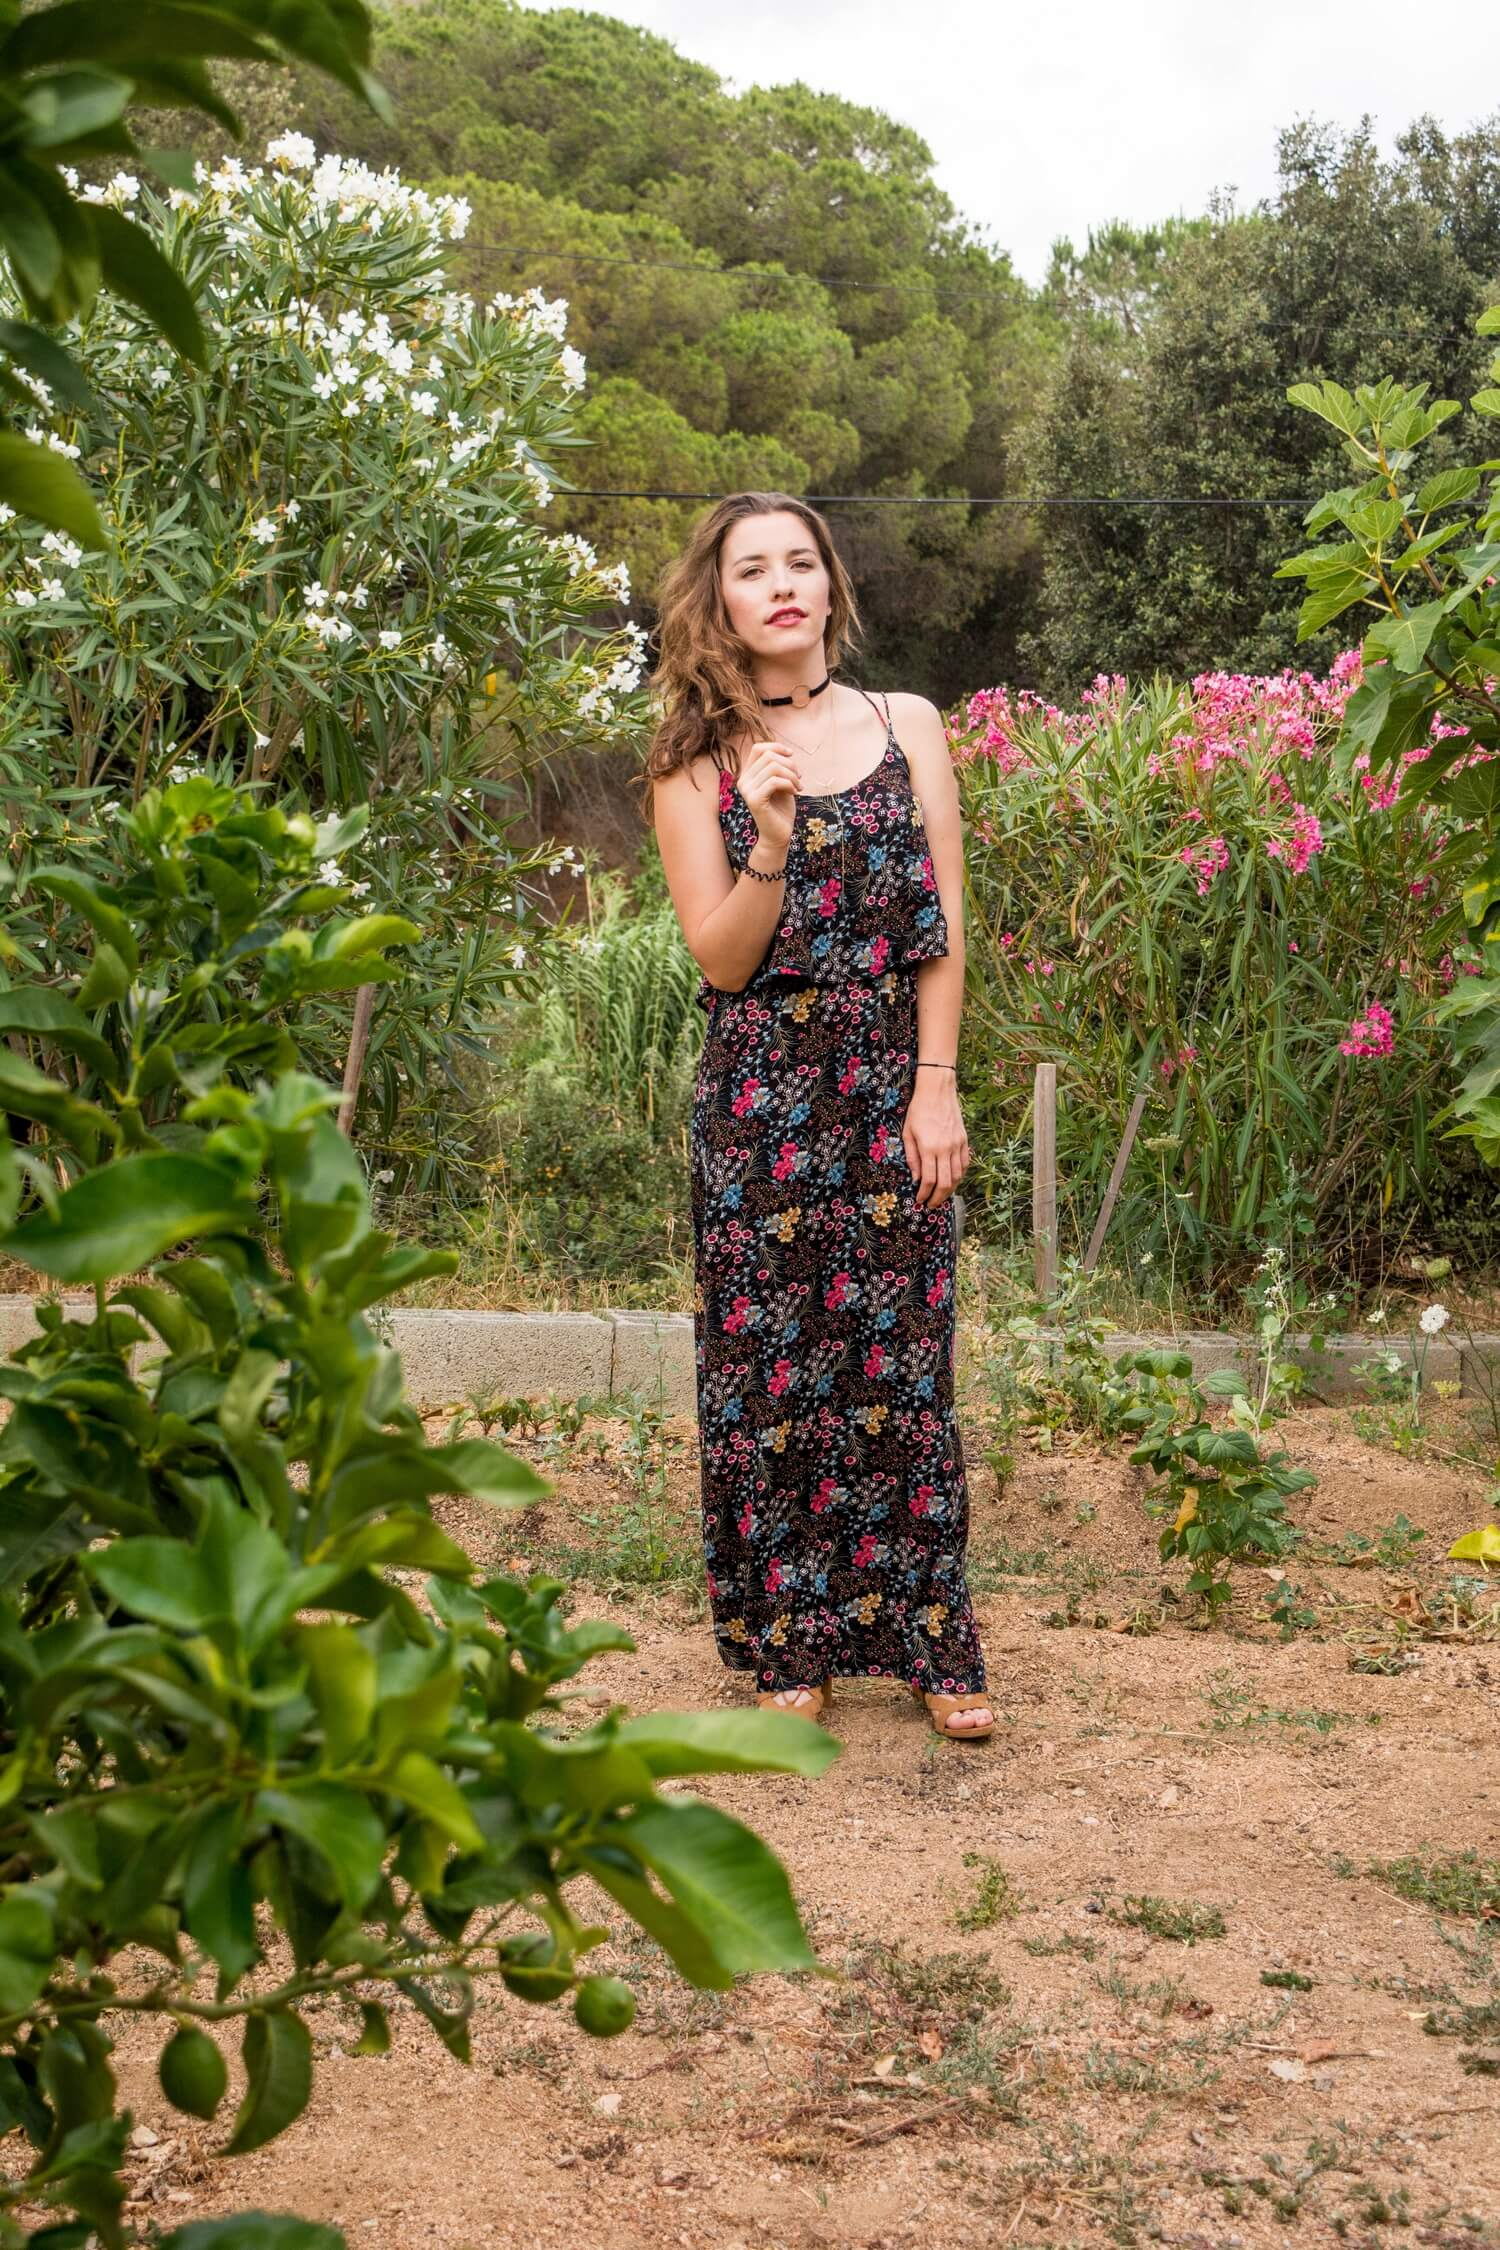 Robe longue à fleurs Pimkie, talons Bershka, collier Tally Weijl | happinesscoco.com